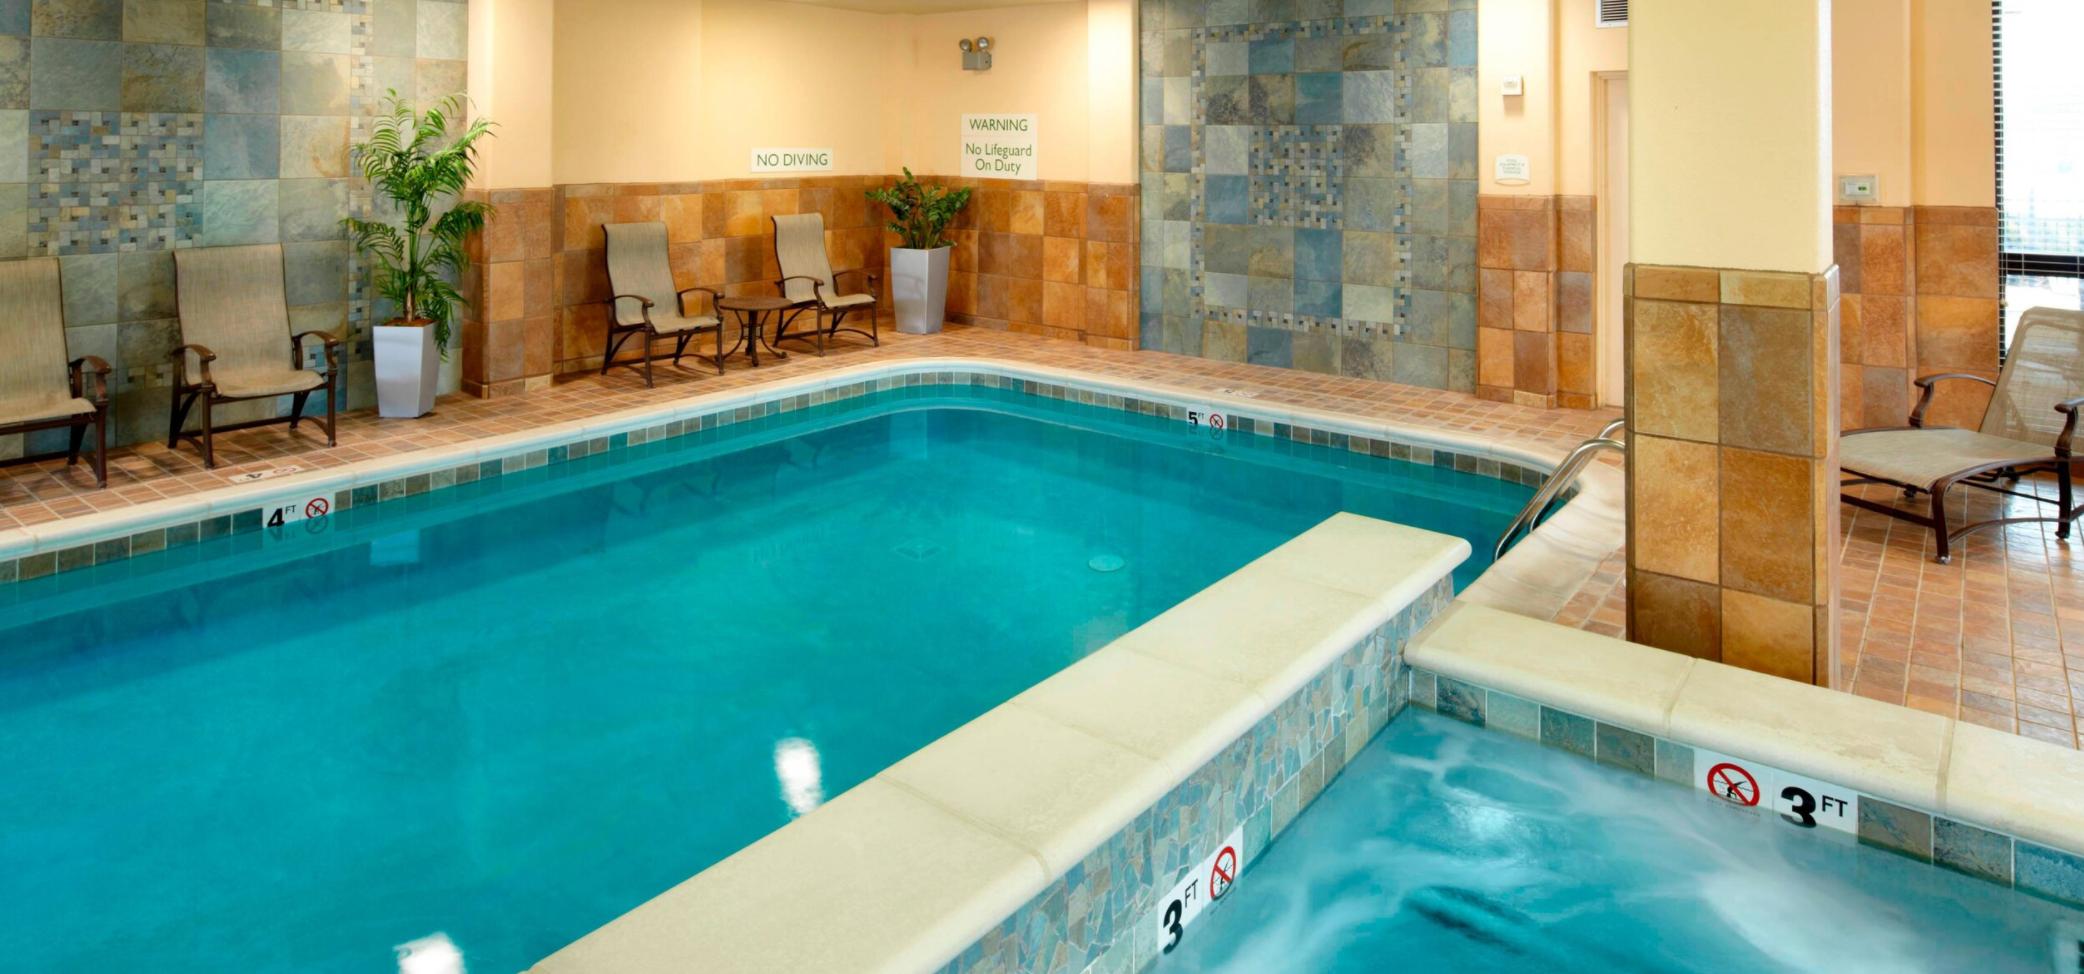 https://www.hotelsbyday.com/_data/default-hotel_image/3/18460/screenshot-2020-06-12-at-4-16-10-pm.png